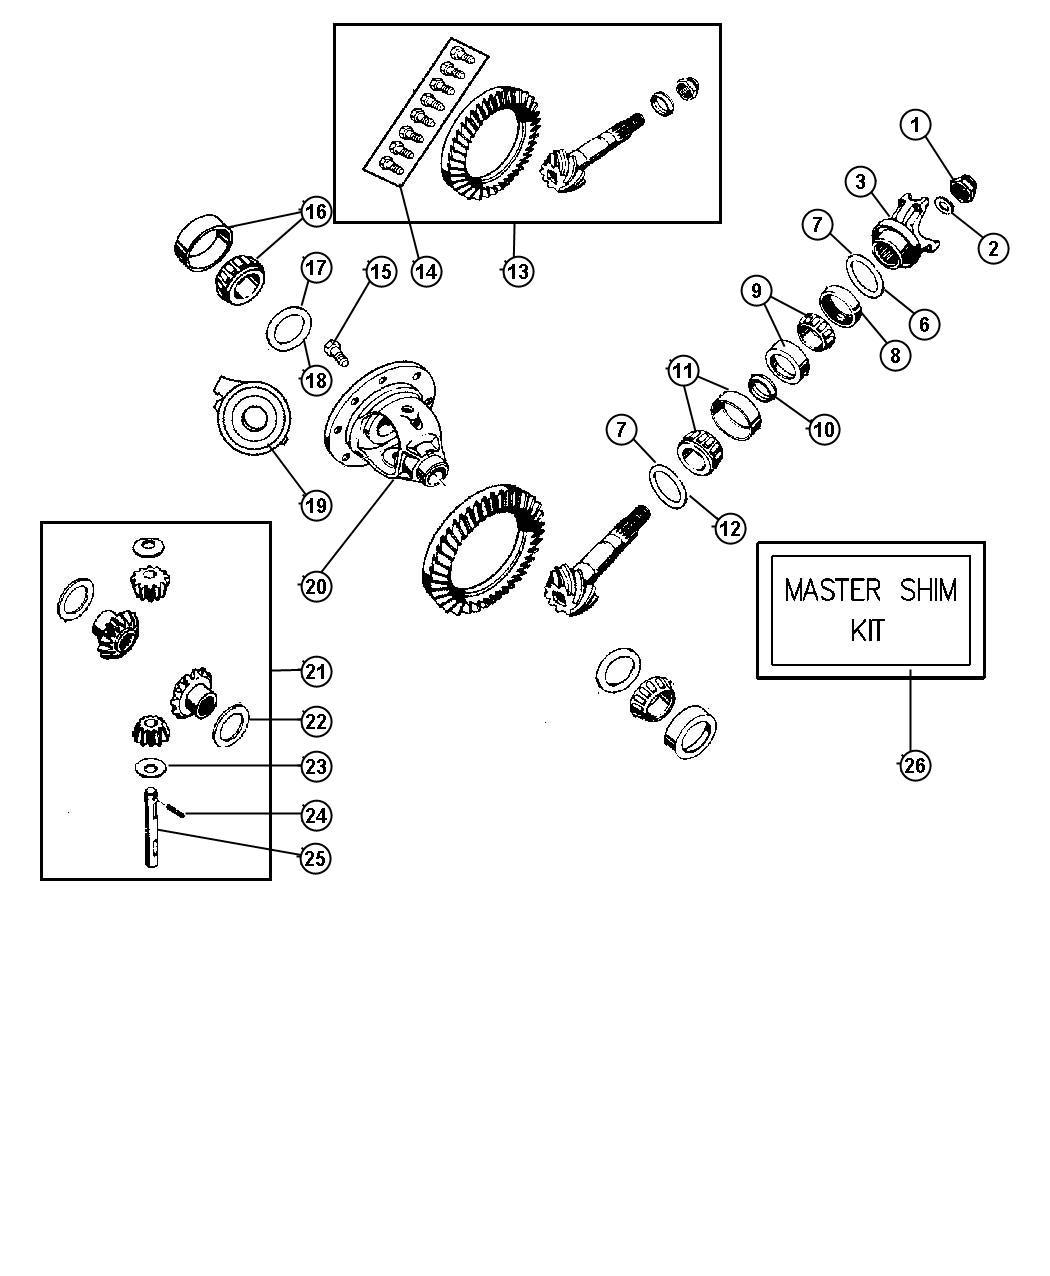 1997chryslersebringwiringdiagram 1997 Chrysler Sebring Gaskets